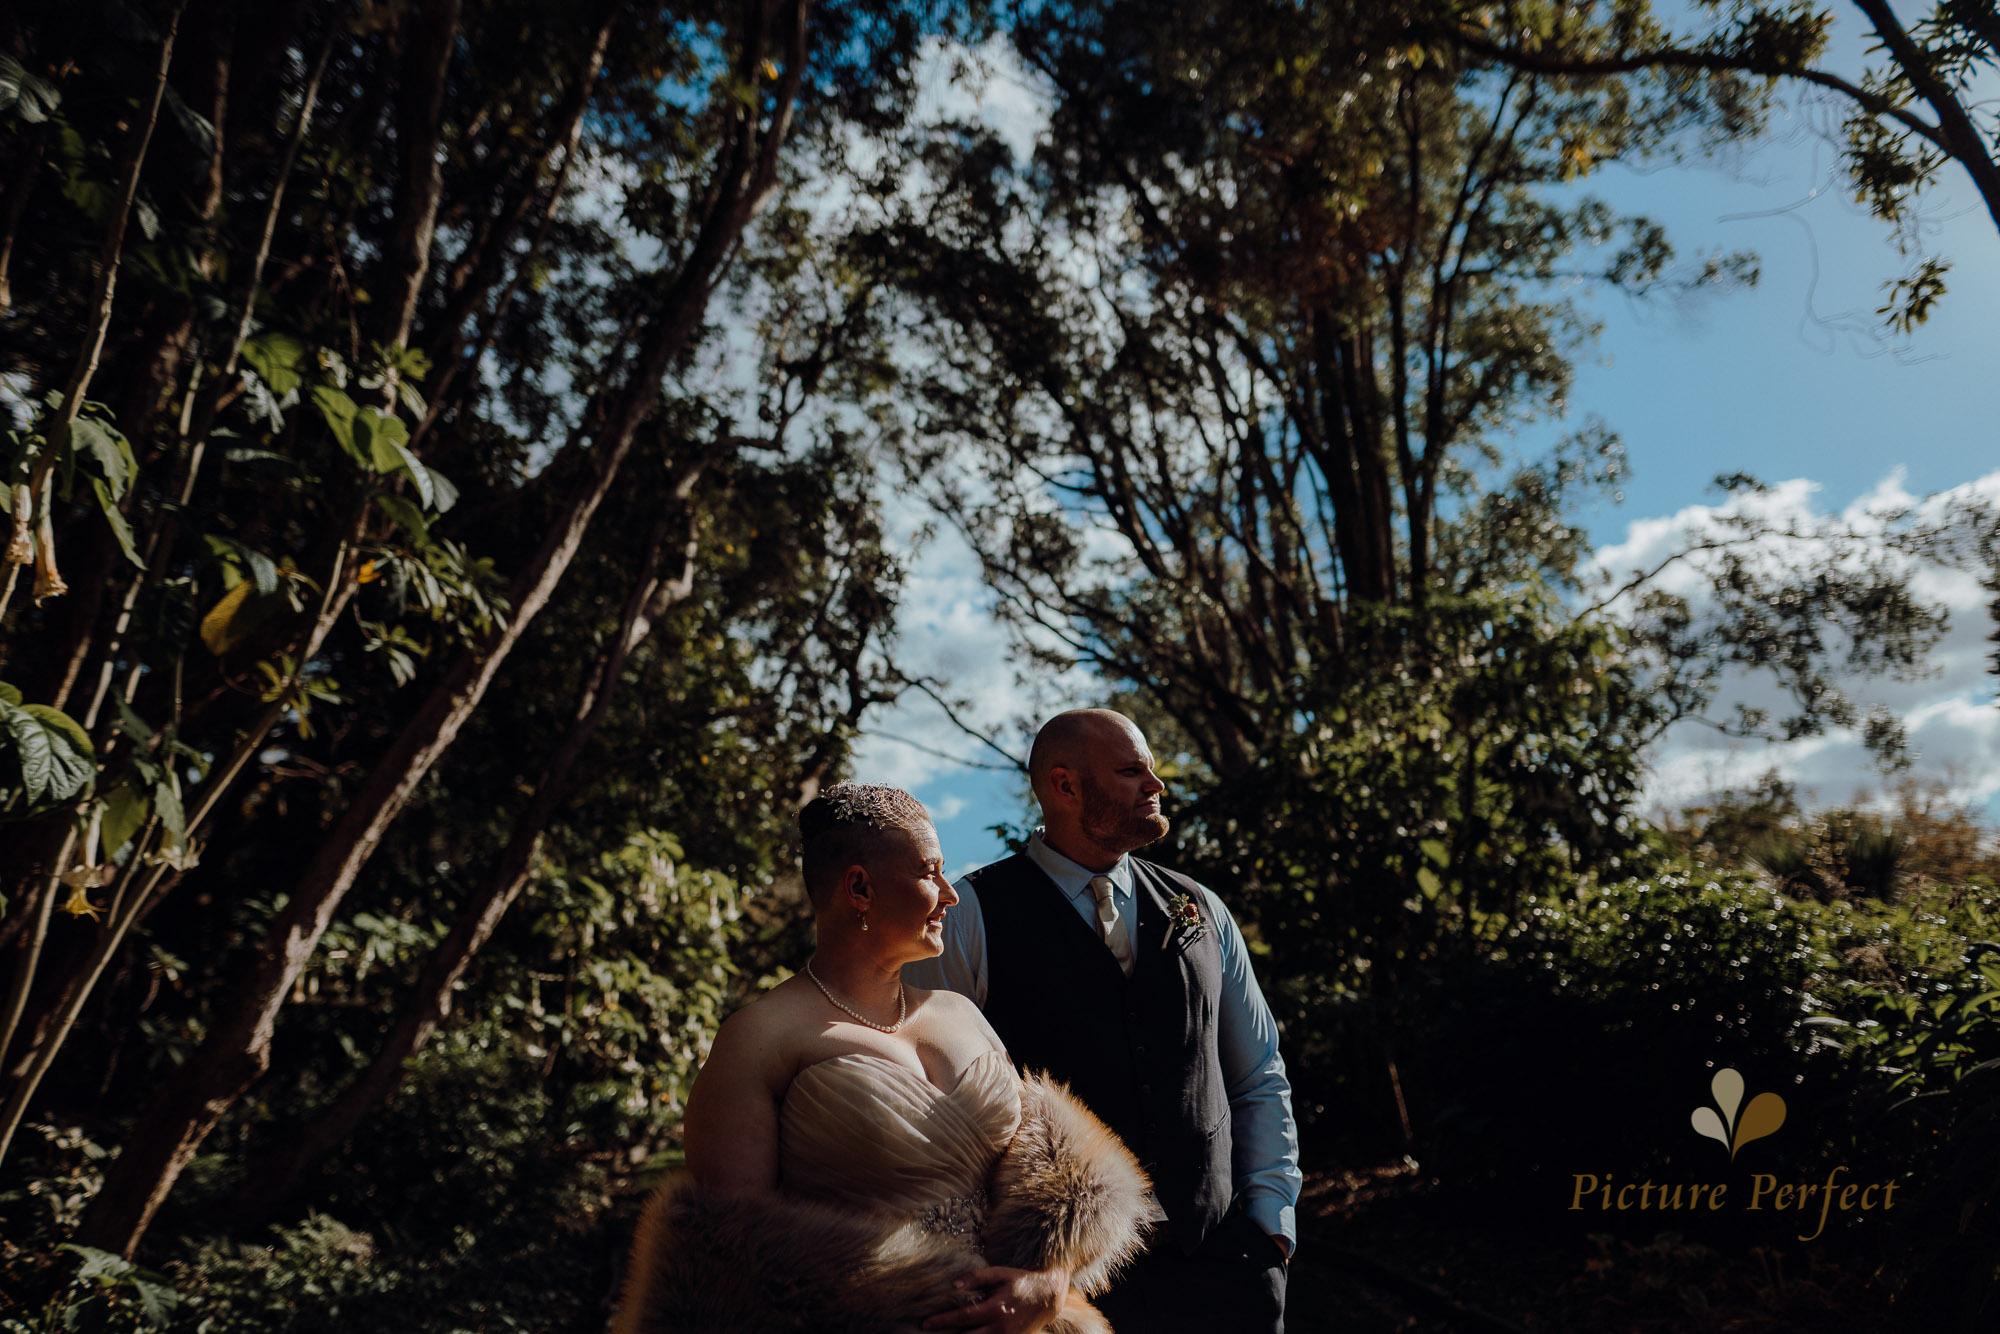 Manawatu beach bridal photography during golden hour with Tina 0013